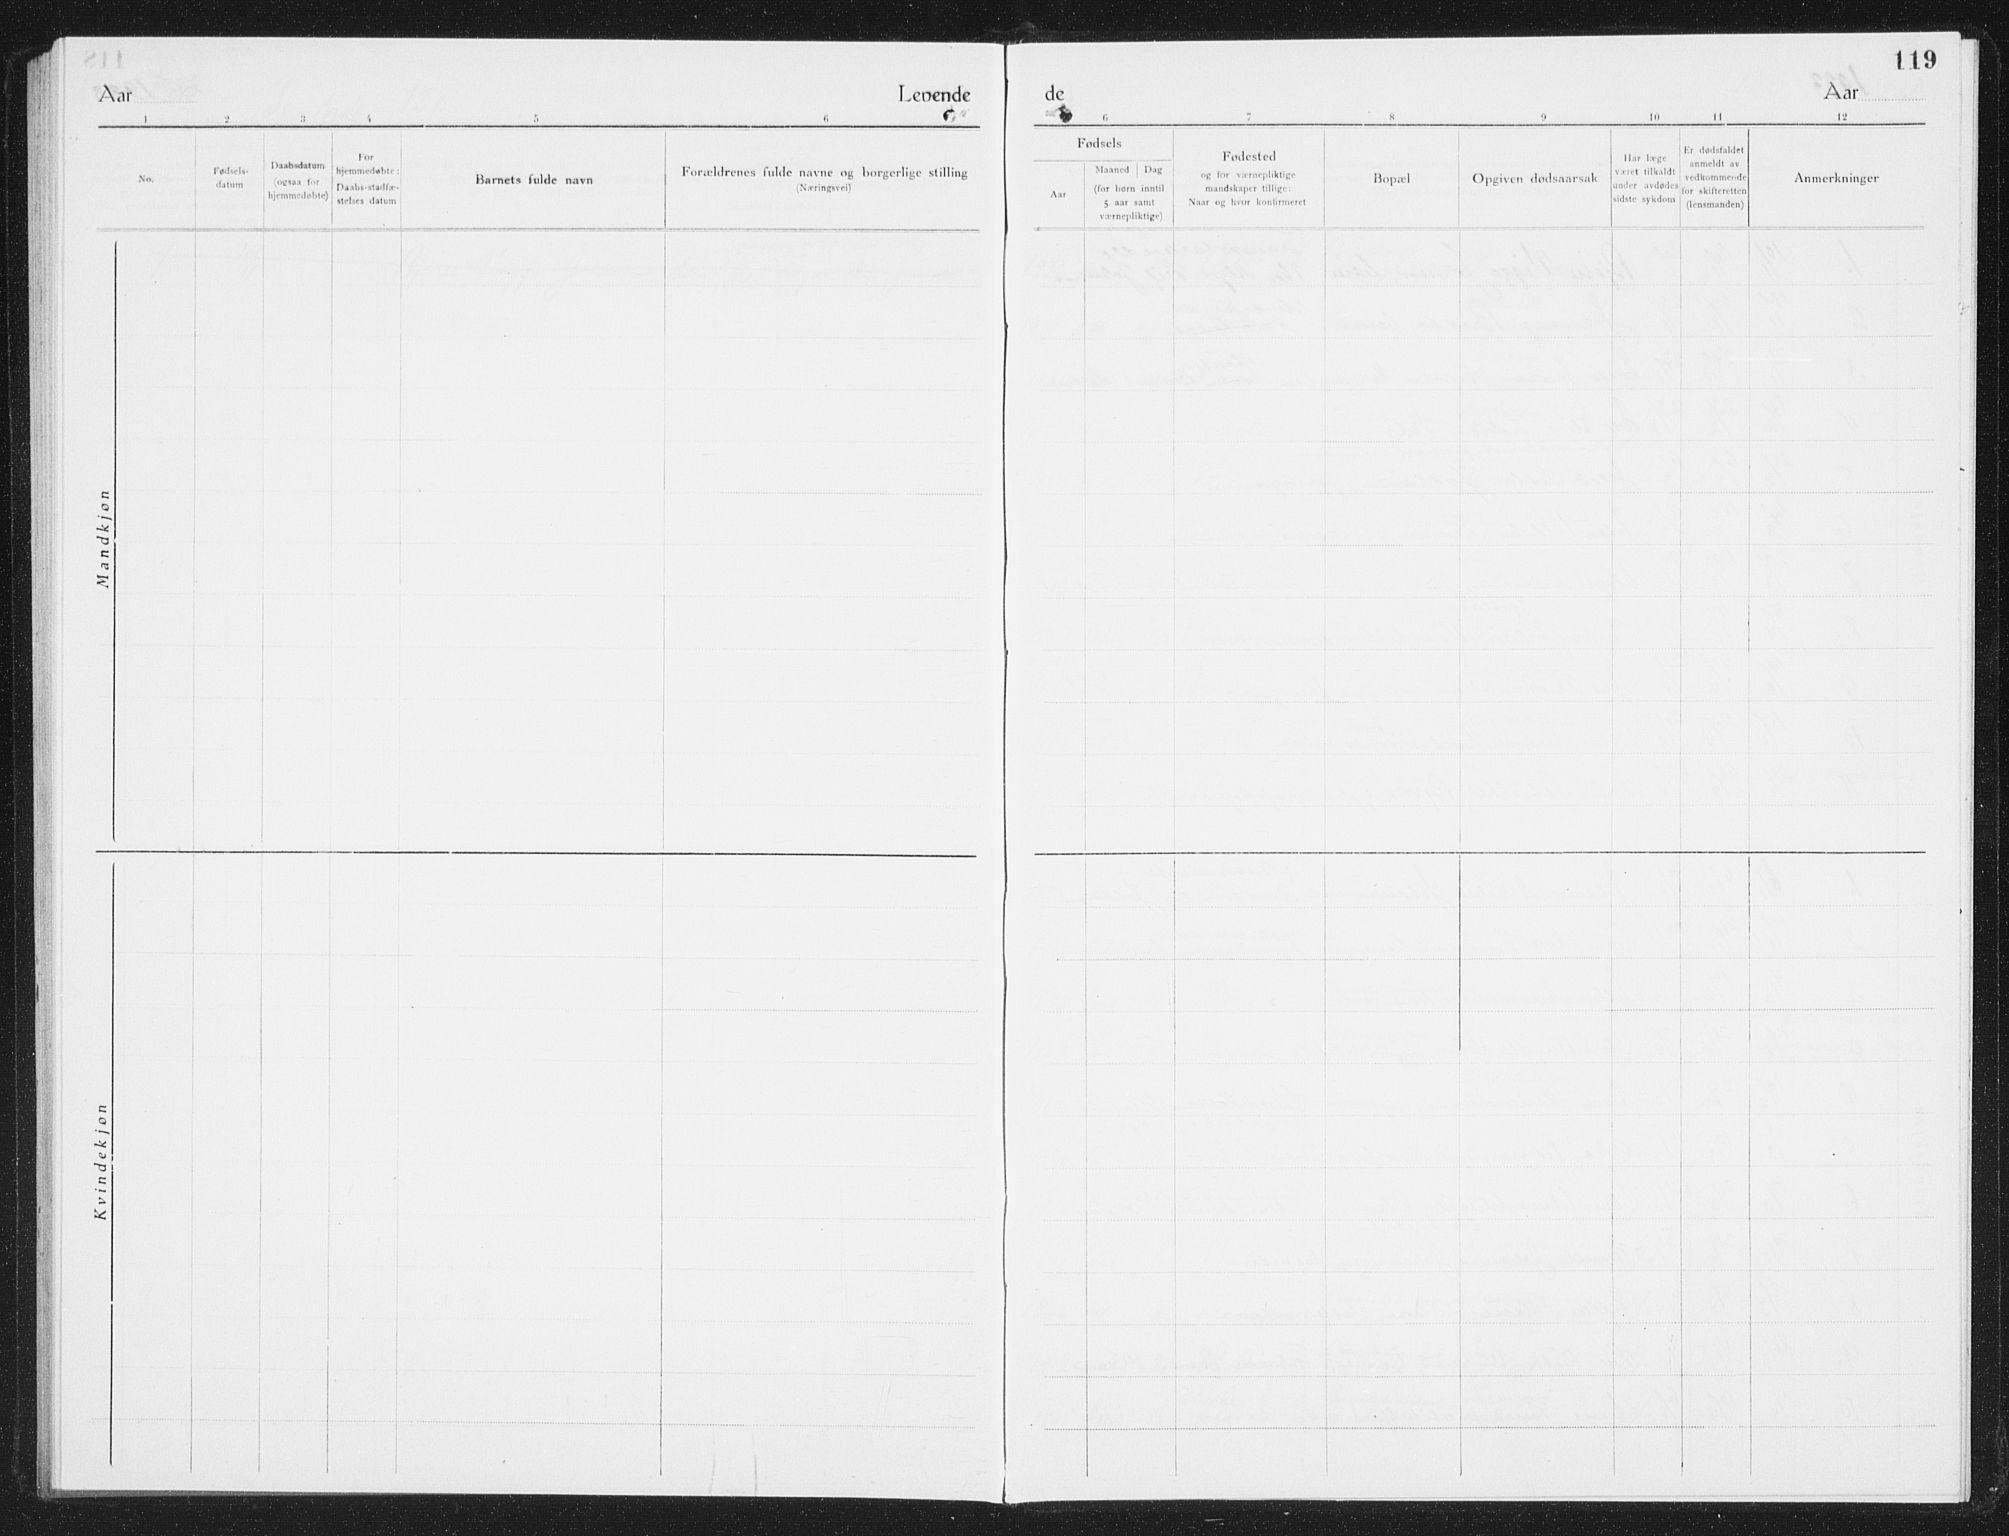 SAT, Ministerialprotokoller, klokkerbøker og fødselsregistre - Nordland, 801/L0036: Klokkerbok nr. 801C11, 1920-1934, s. 119